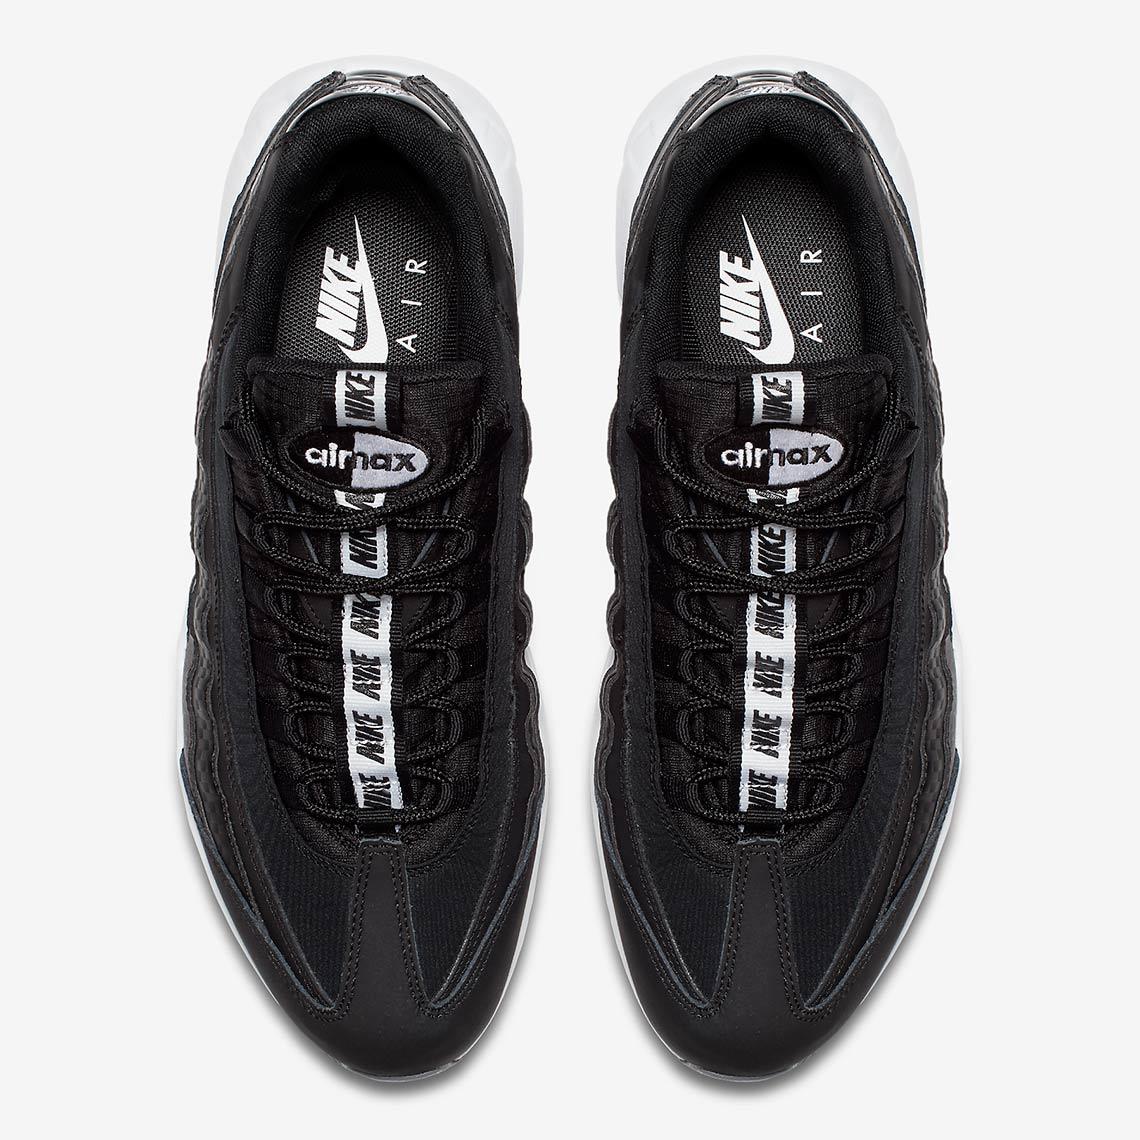 Nike Air Max 95 Pull Tab Available Now AQ4129 002 AQ4129 001